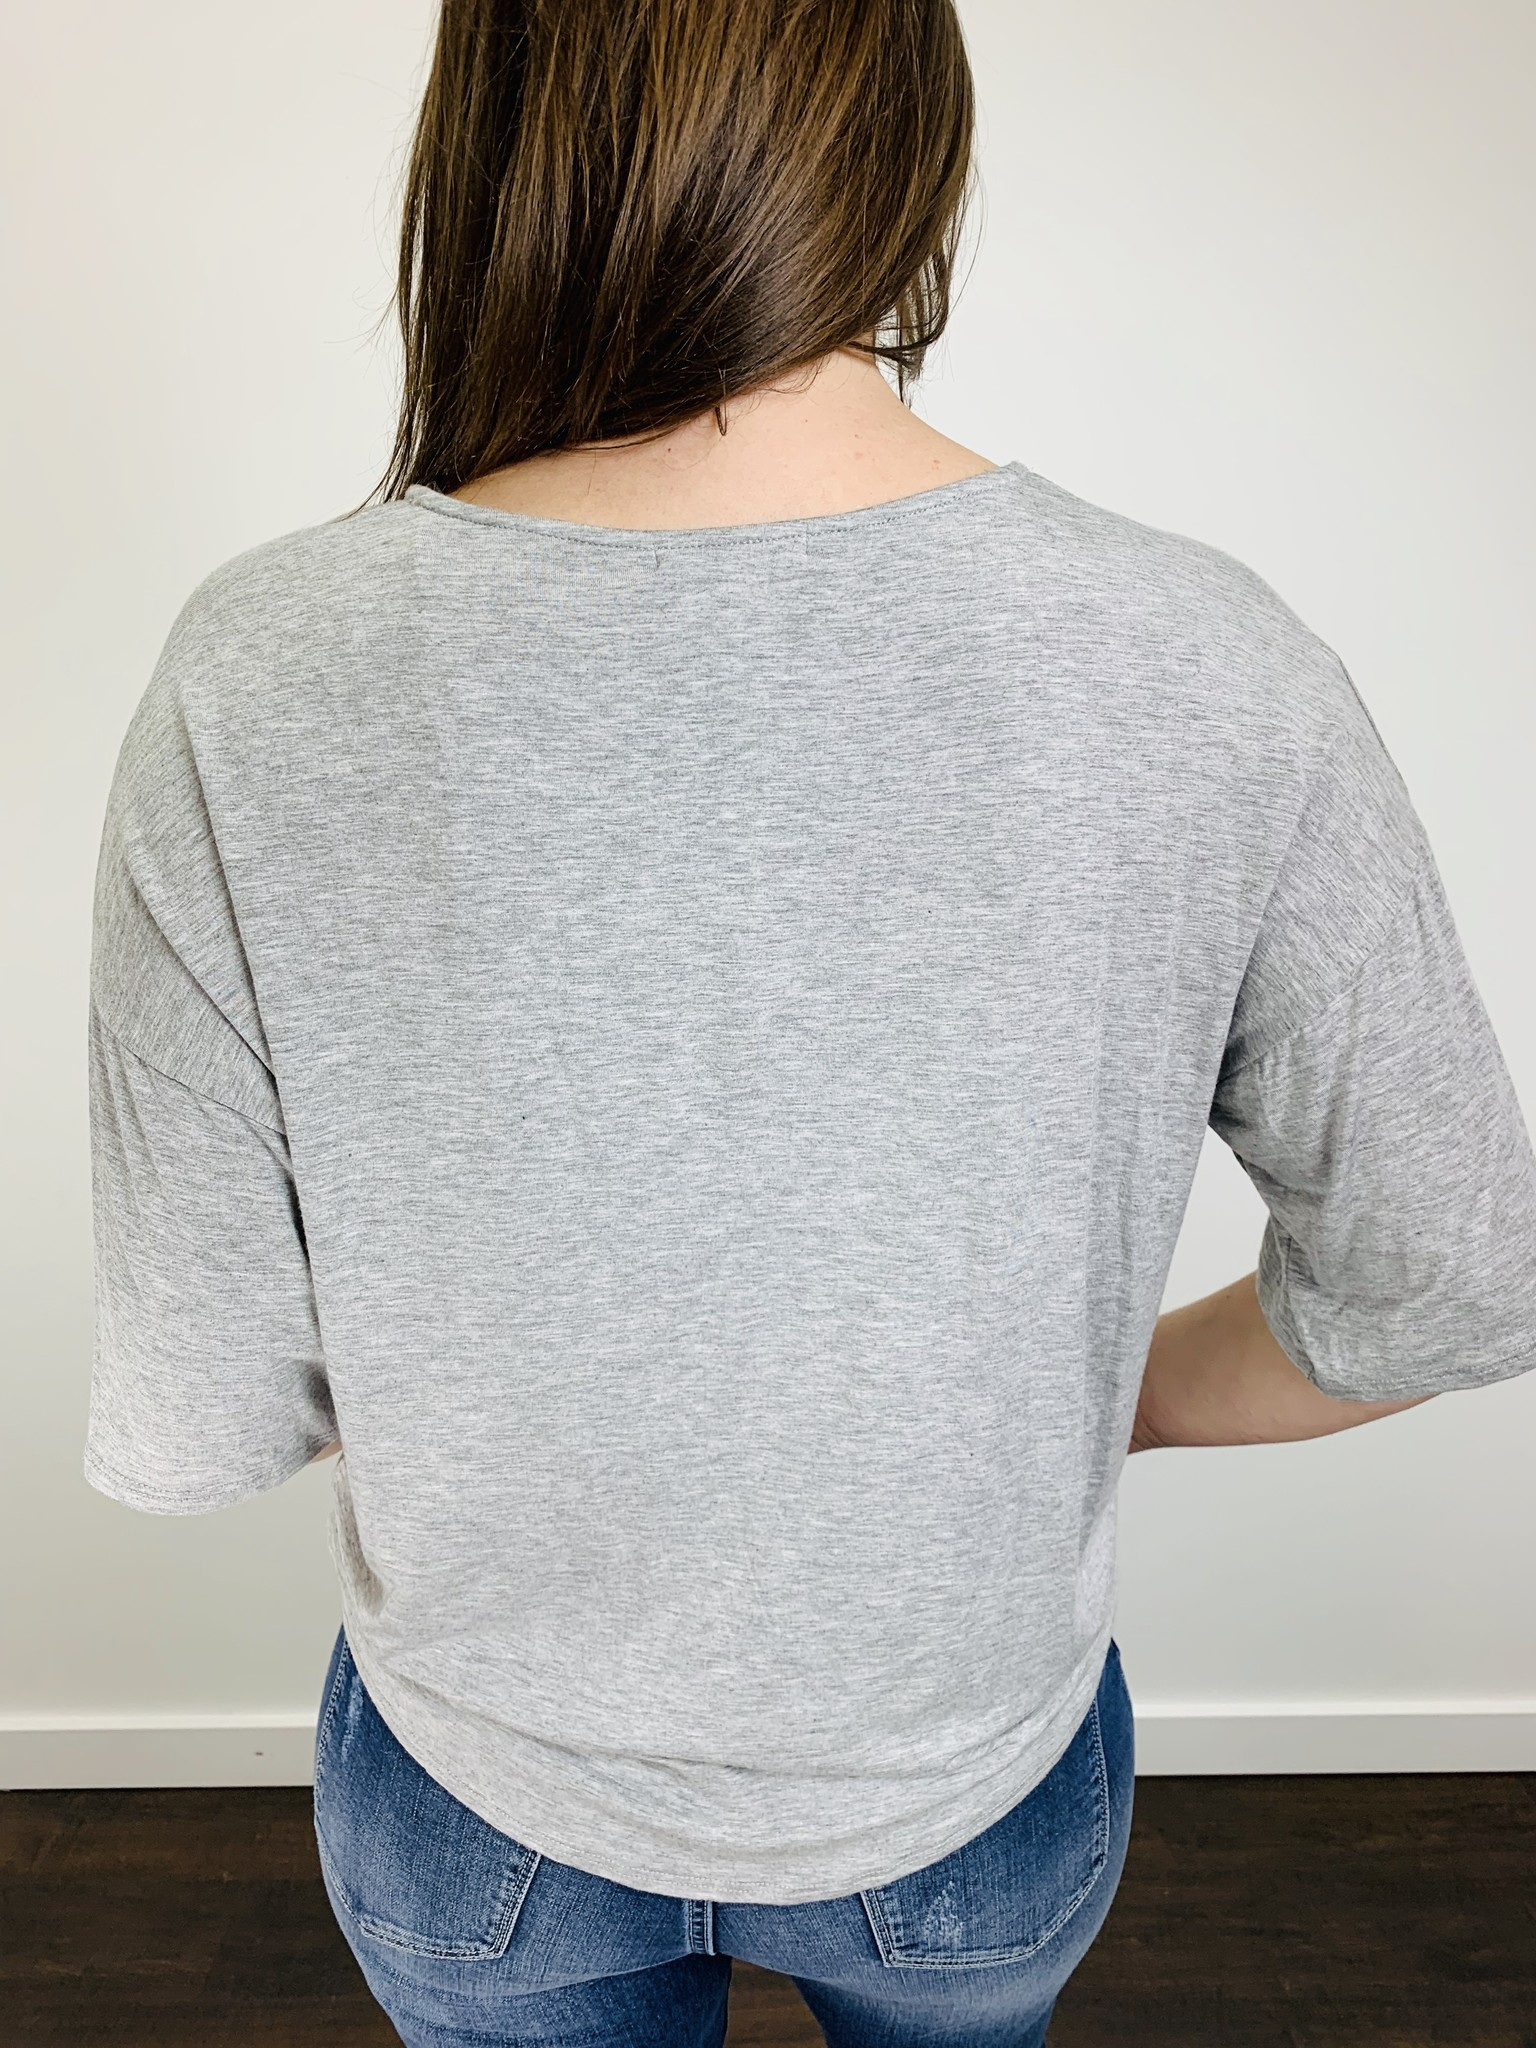 KLD VNeck Tie Front Jersey Tee in Heathered Gray